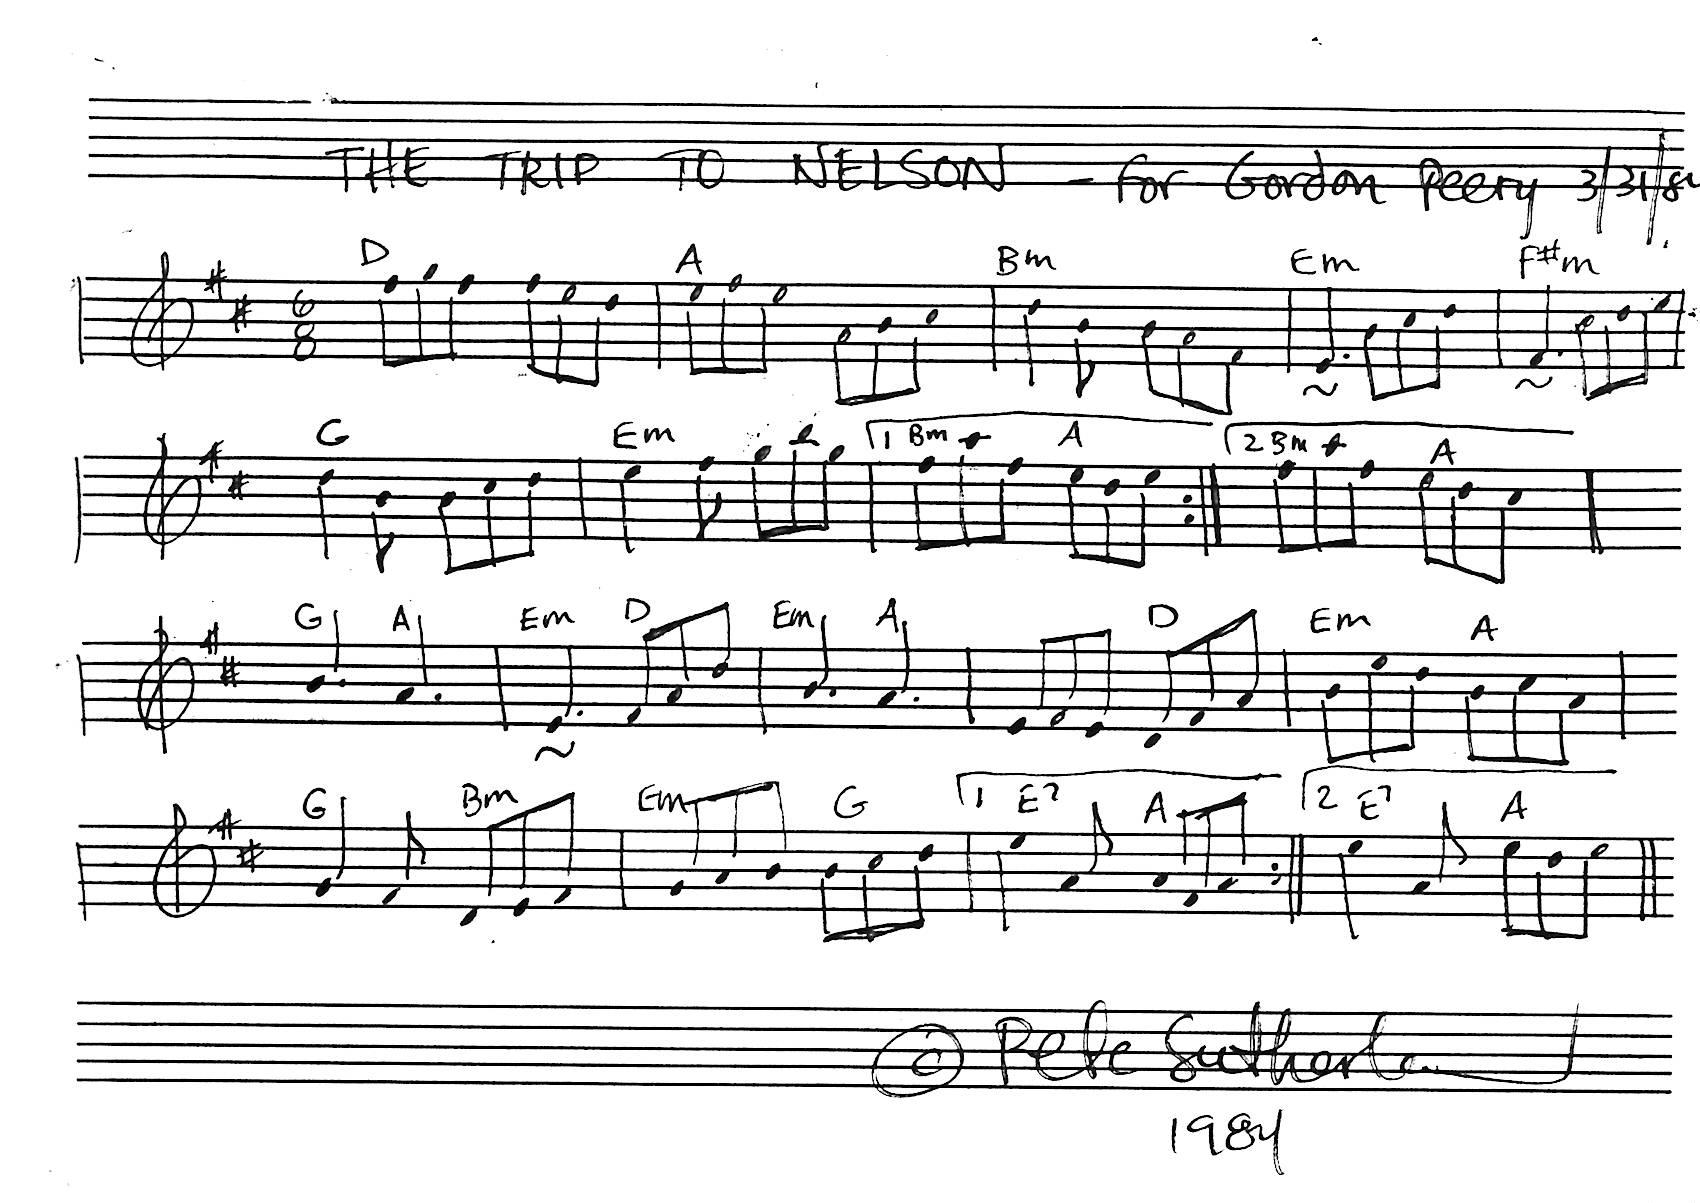 The original manuscript of the tune Trip to Nelson.